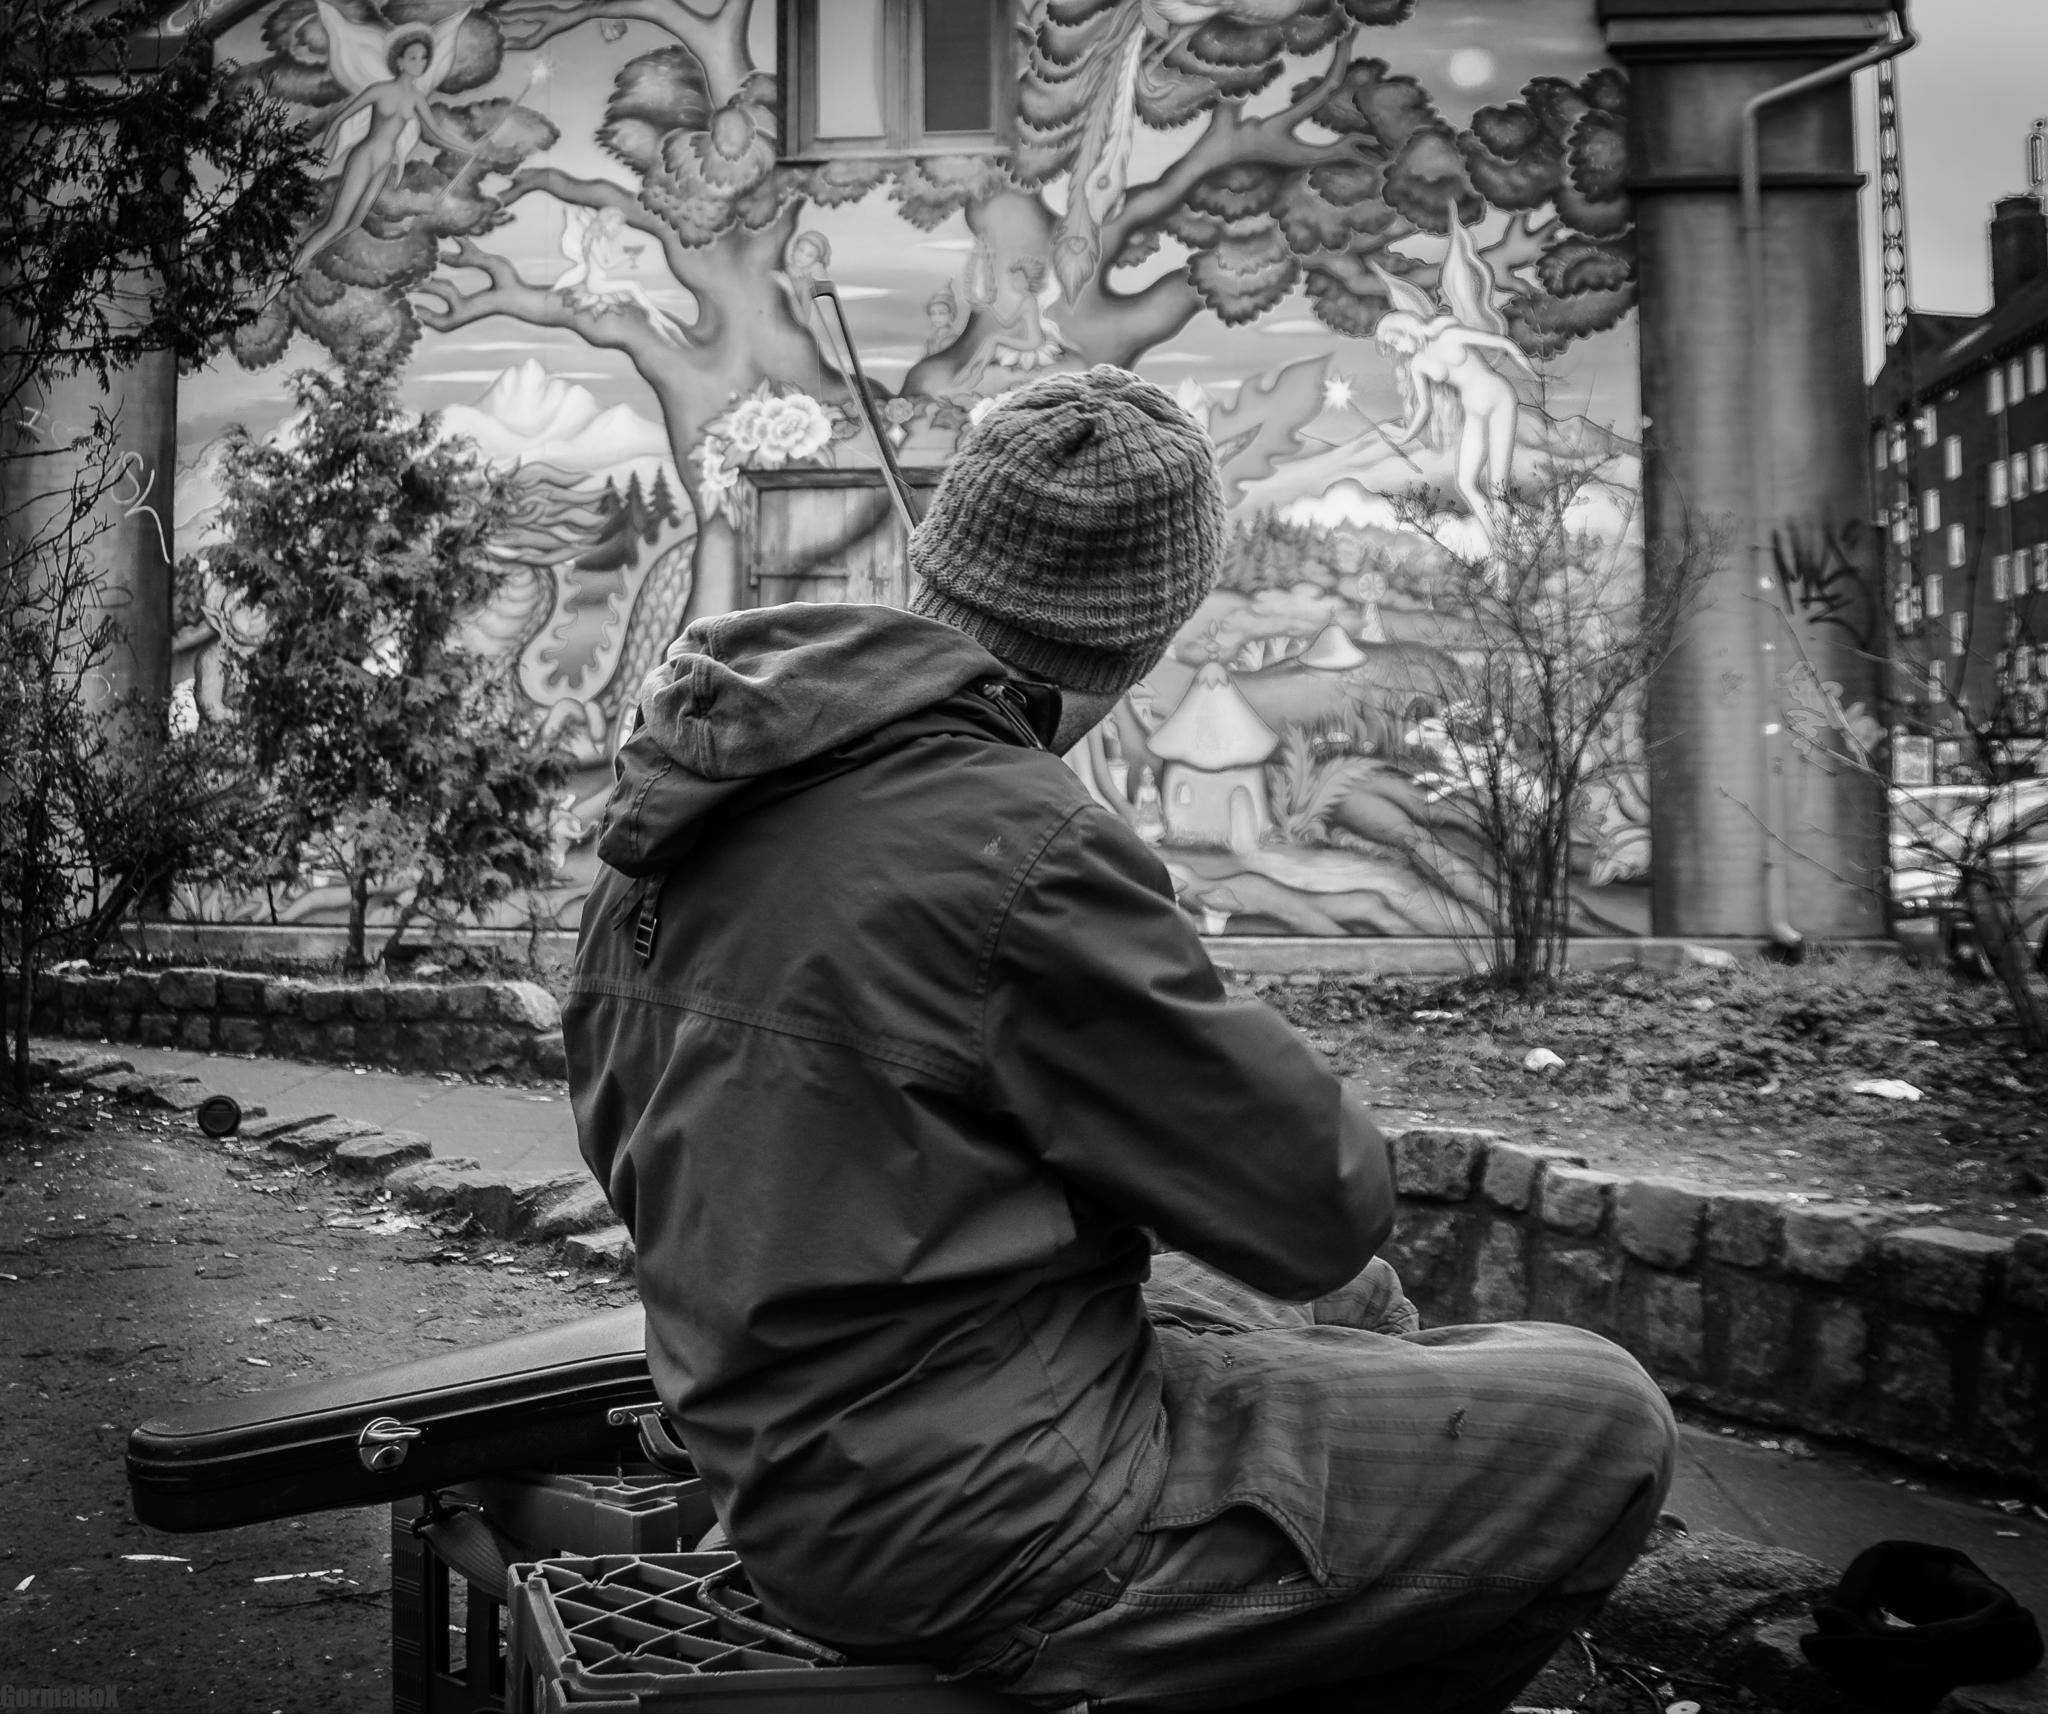 Untitled by Franke Gormadoc